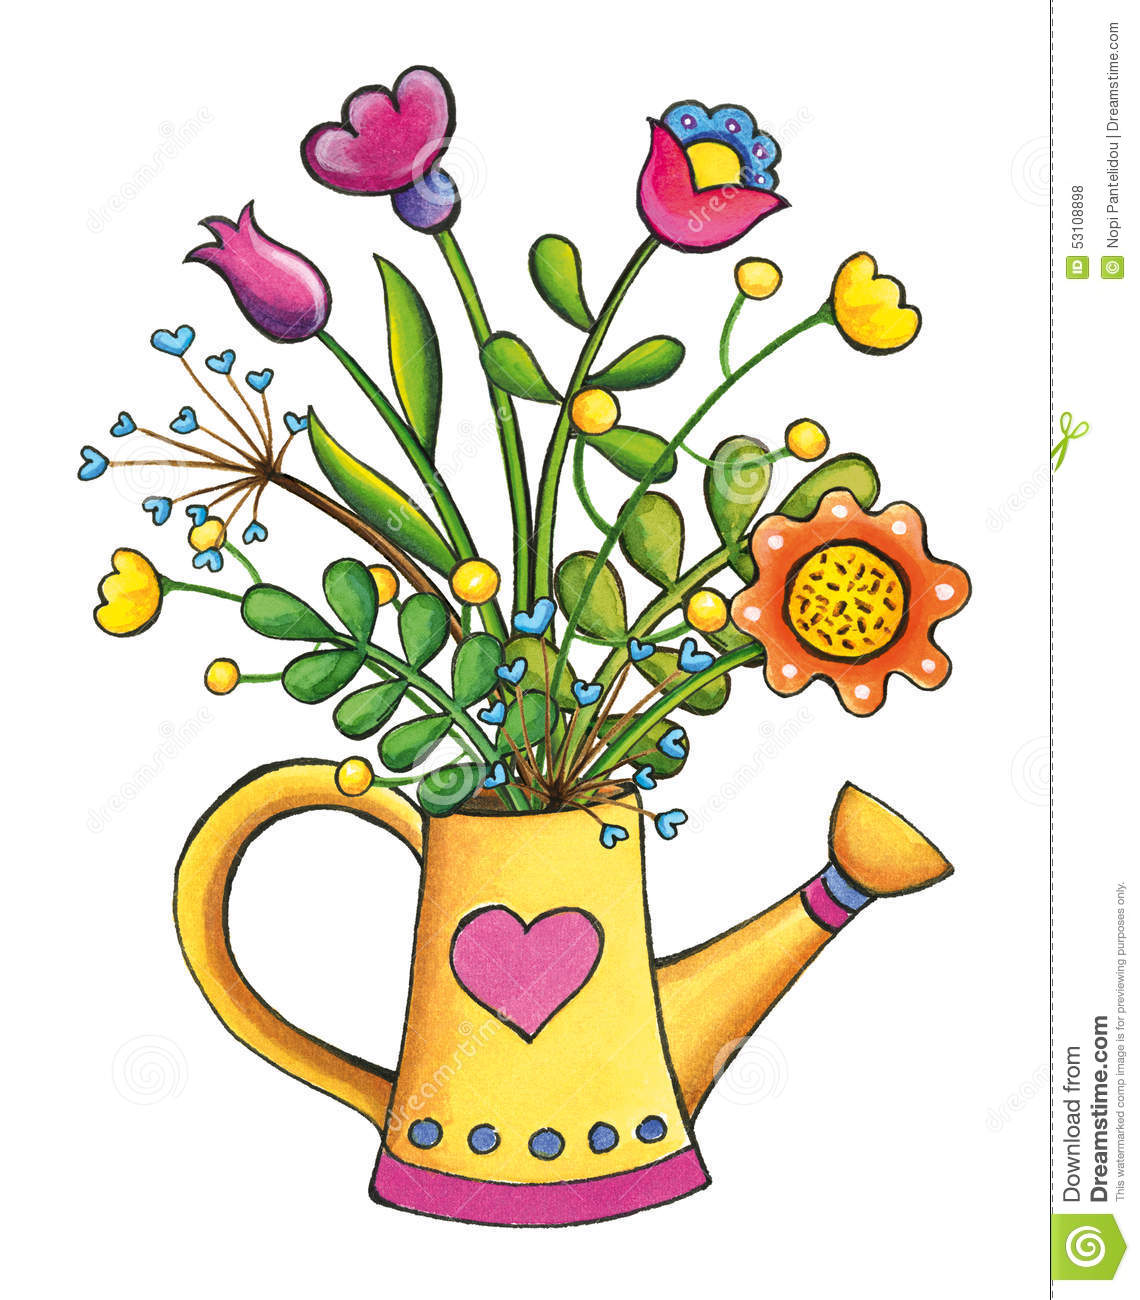 Clip art flowers bouquet. Birthday clipart clipartfest hand